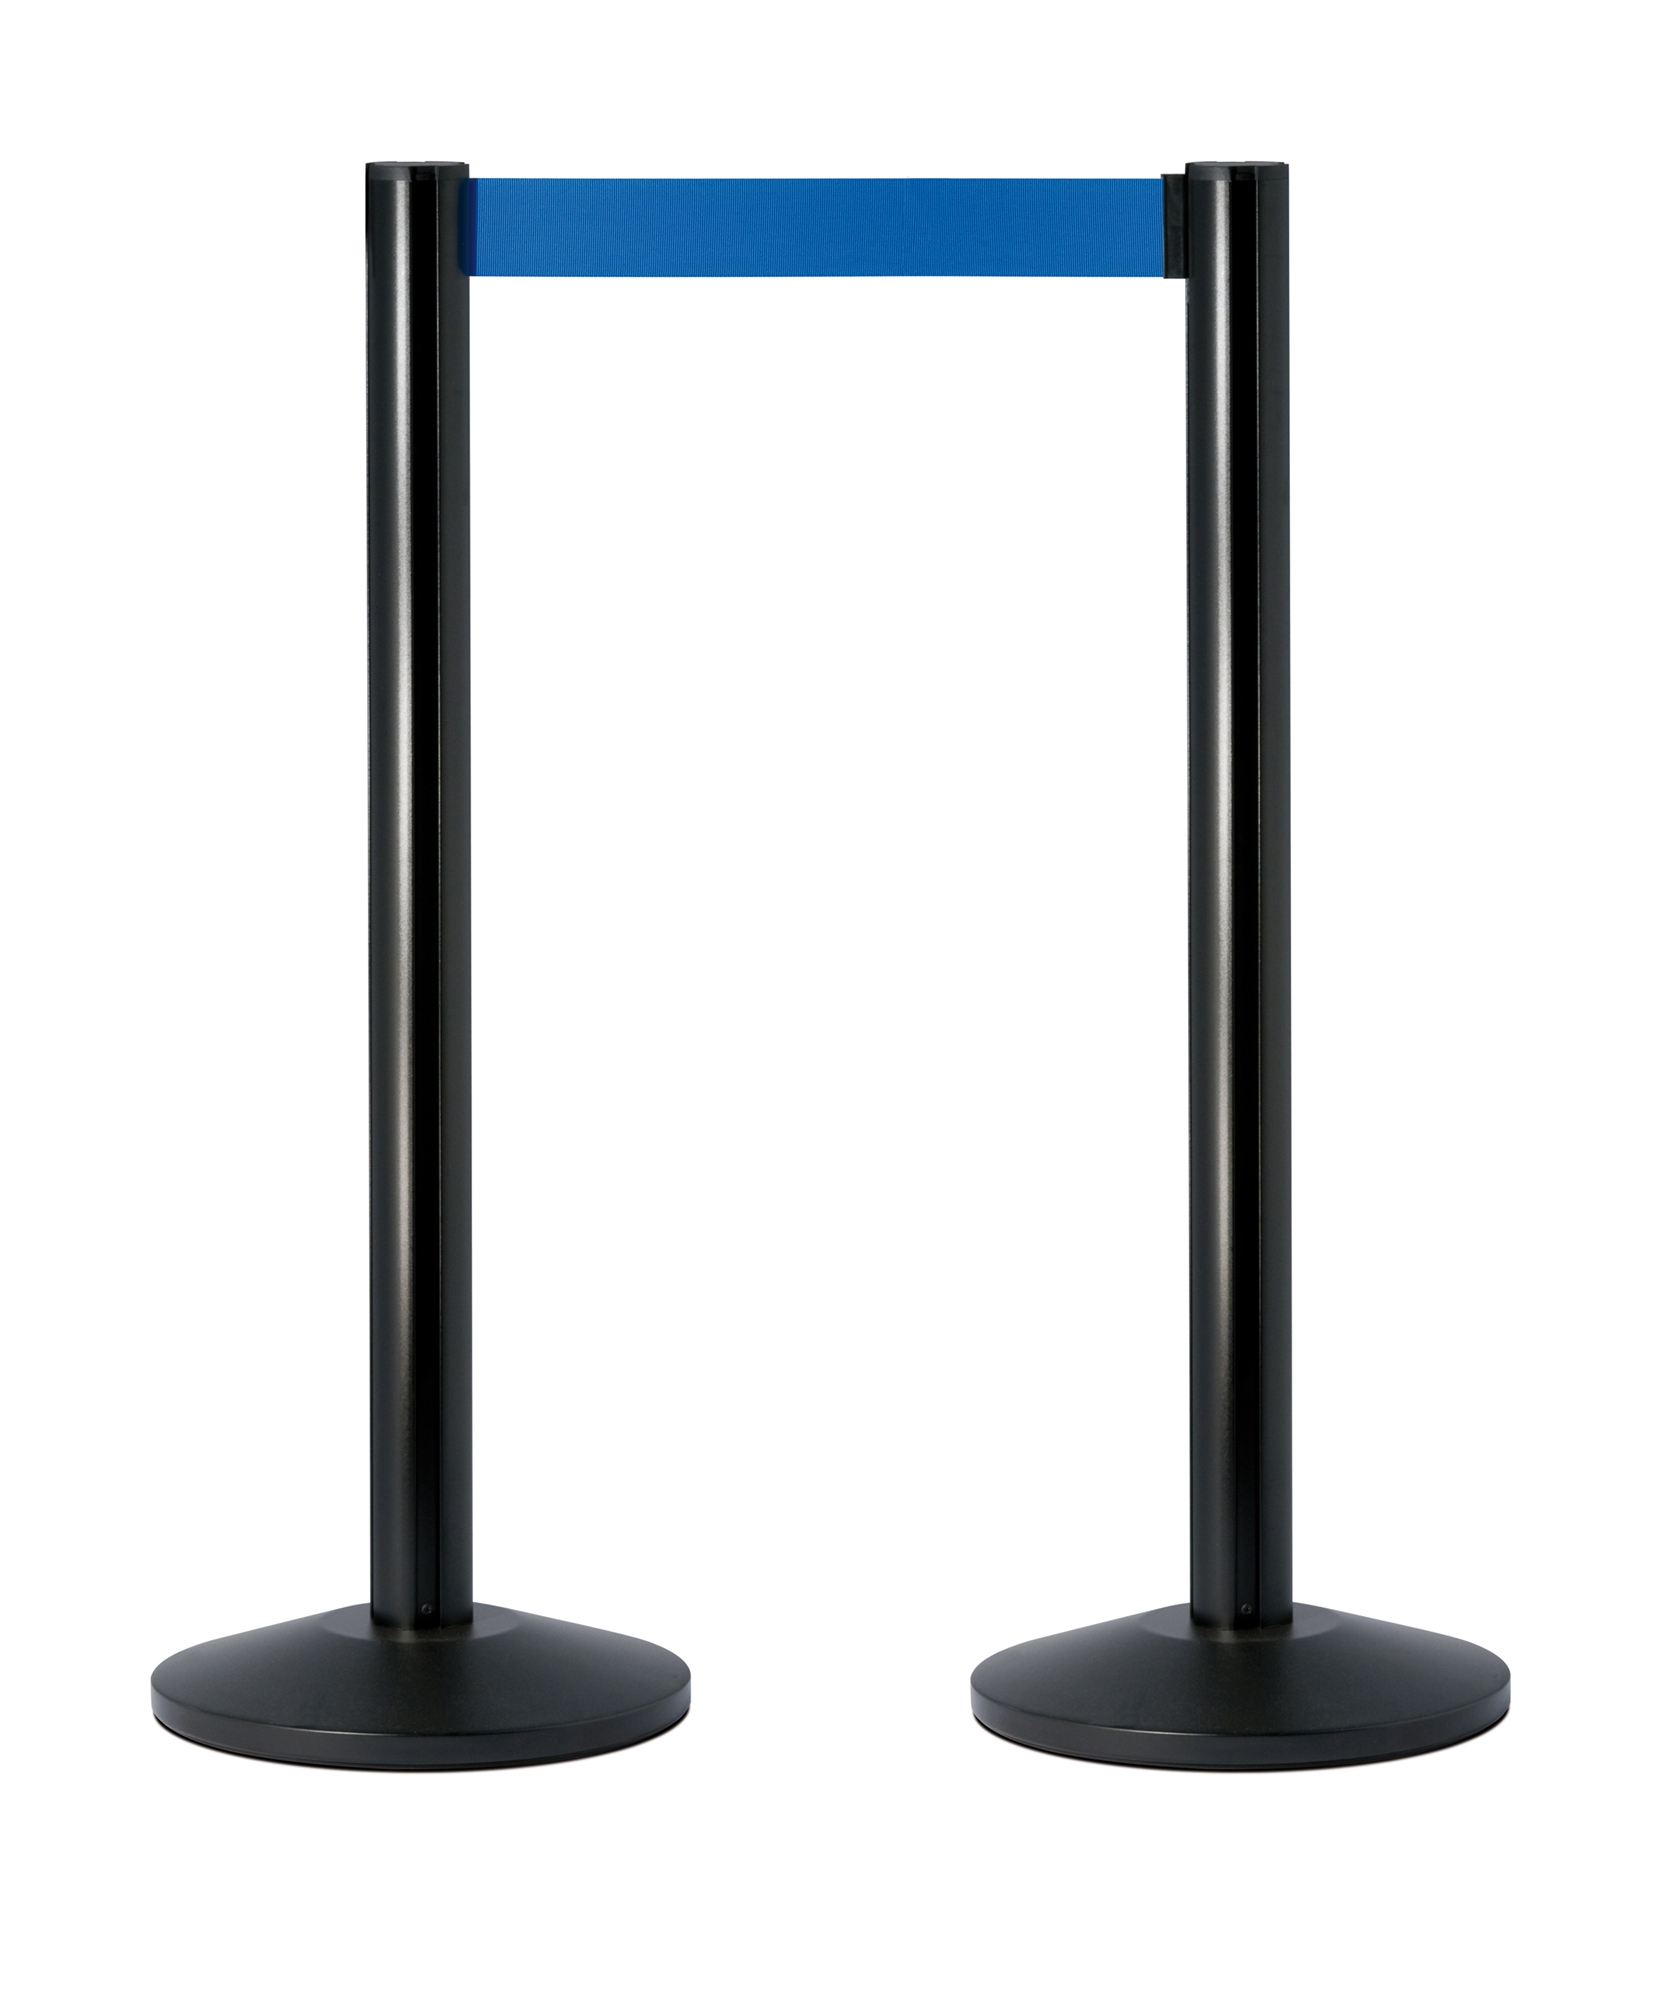 Barriere extensible colonne aluminium noir ruban bleu - Colonne aluminium prix ...